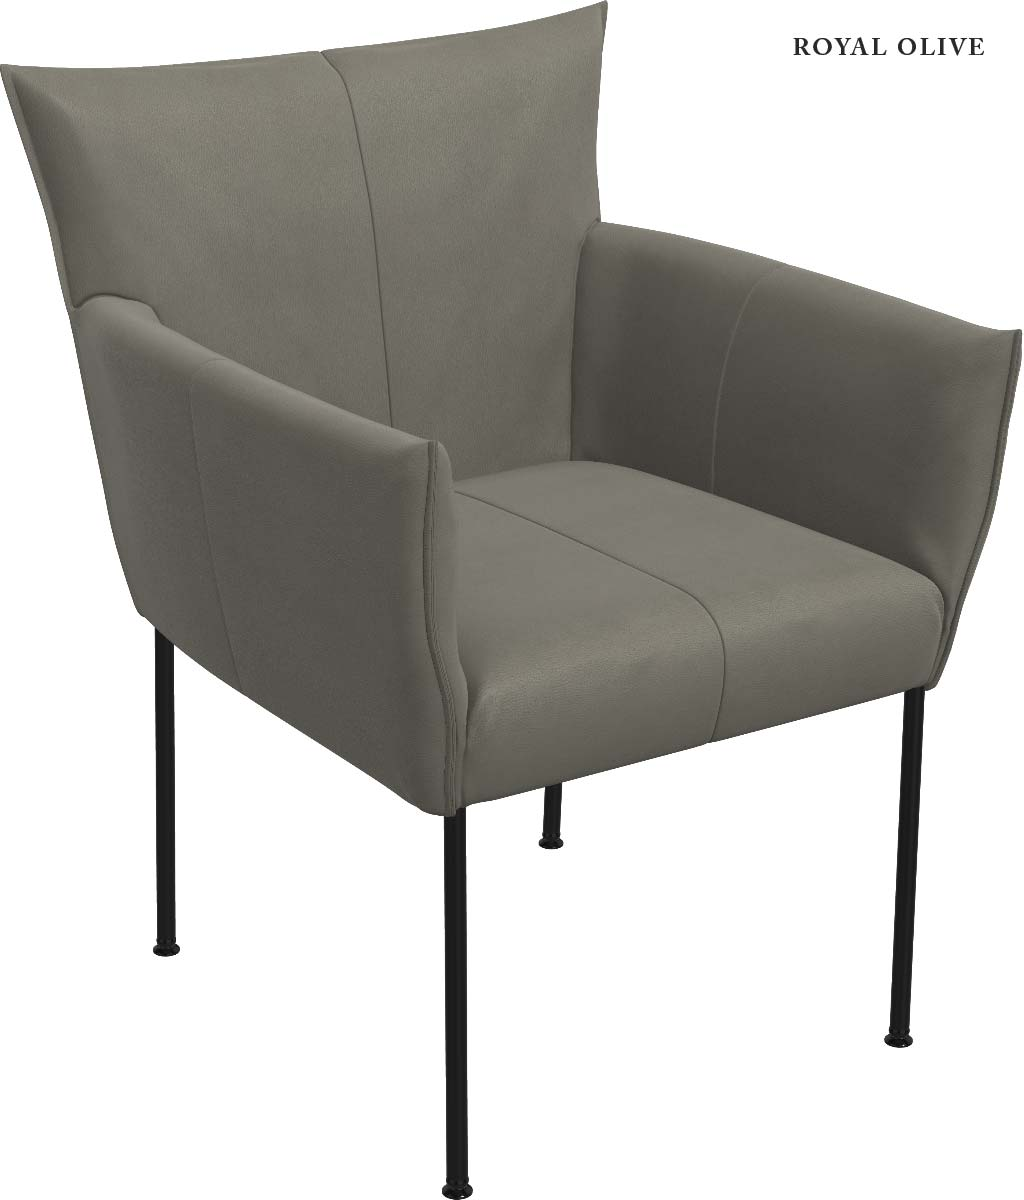 jess-design-stuhl-forward-forza-royal-olive-lichtraum24